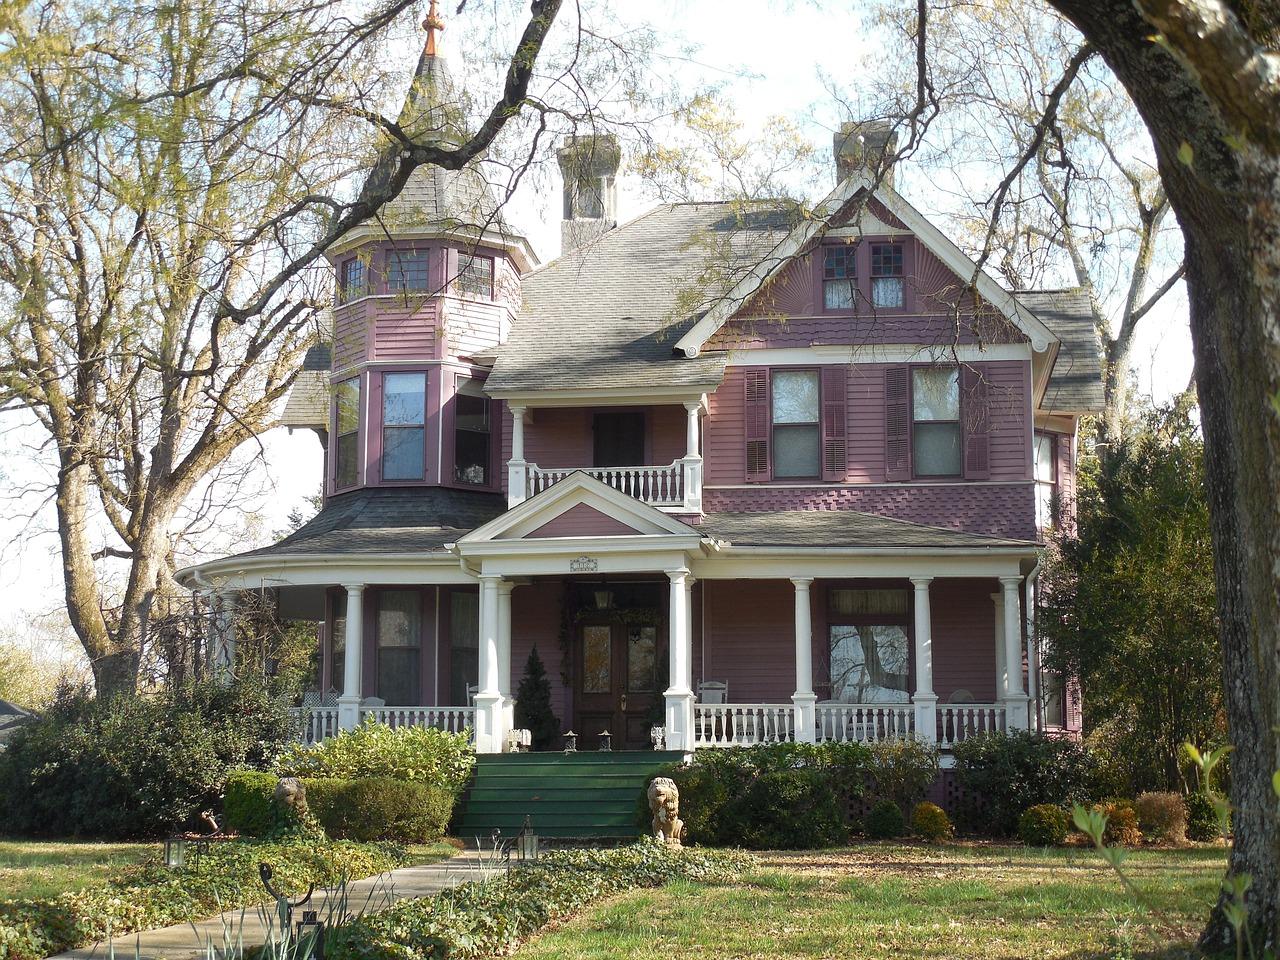 Victorian homes for sale near culpeper, orange, locust grove, va by sean jones